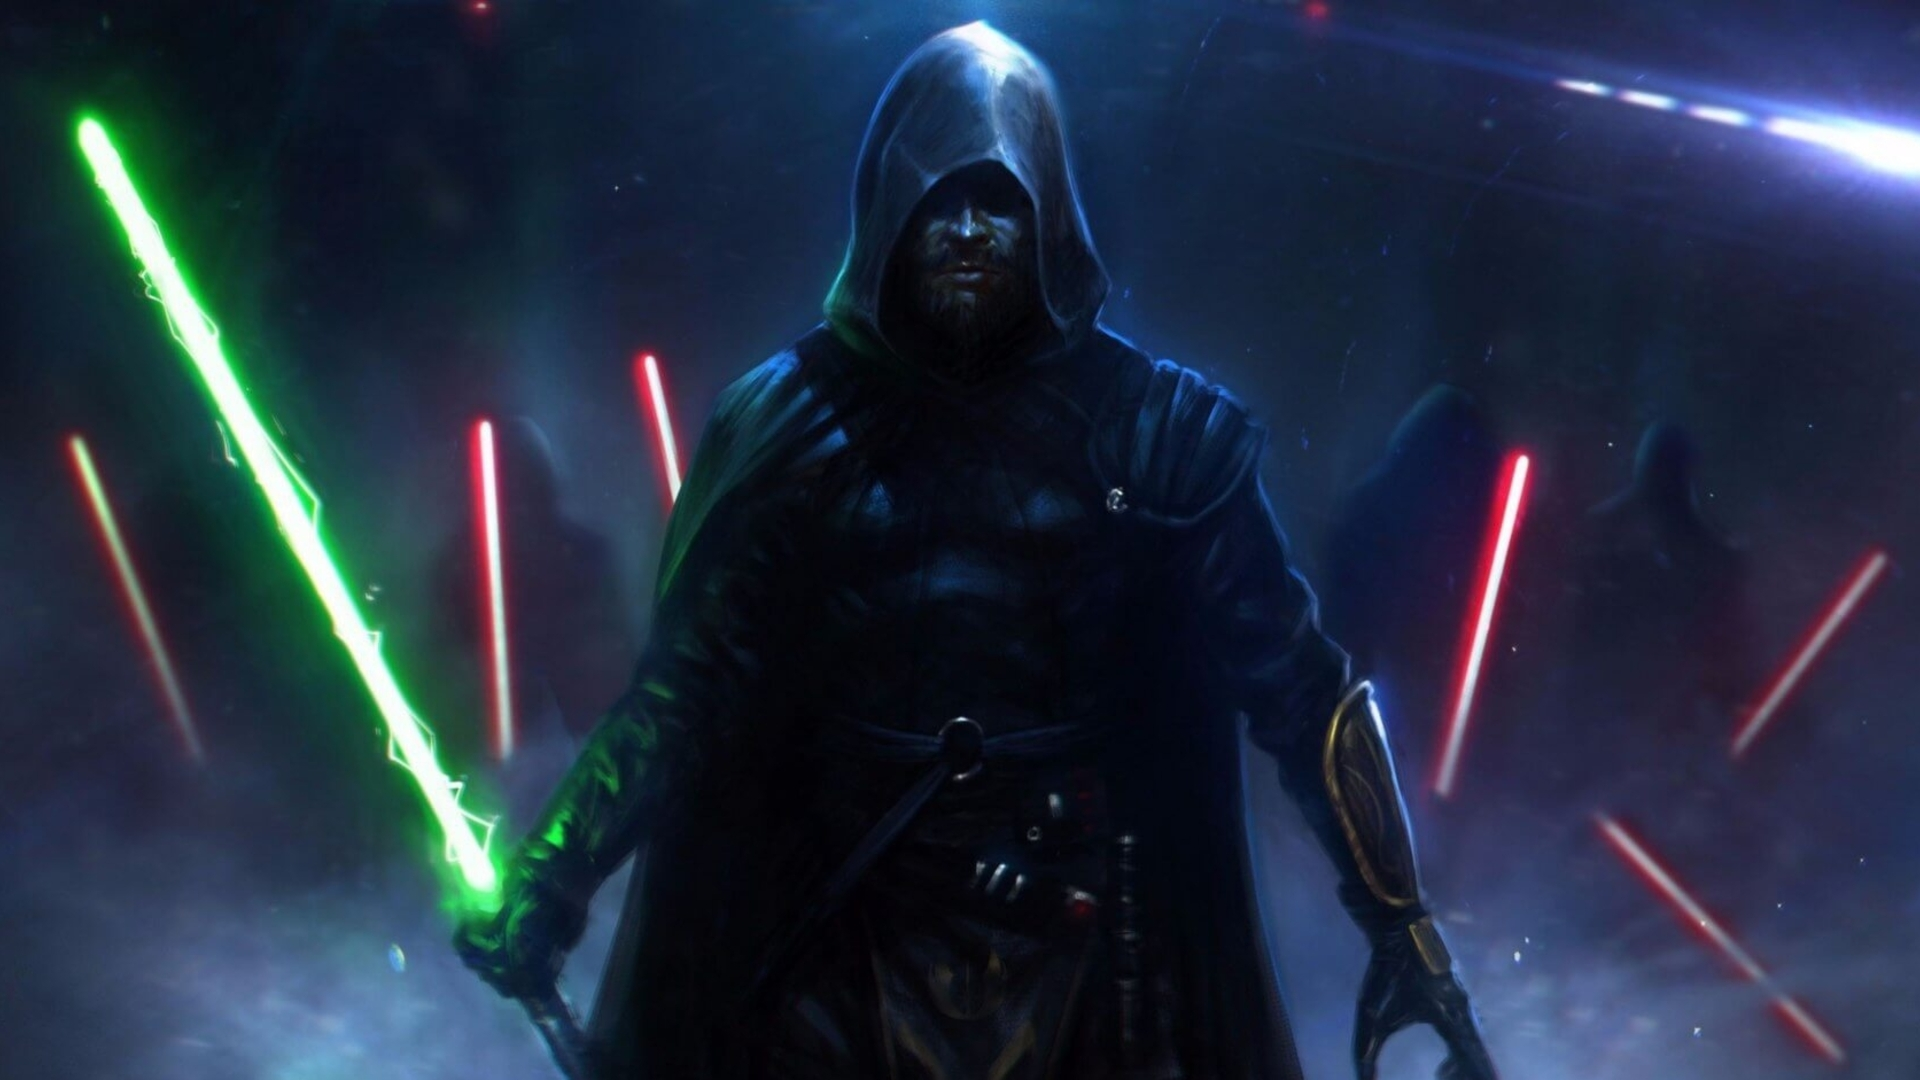 Star Wars Jedi Fallen Order Shown The Logo Of The New Respawn